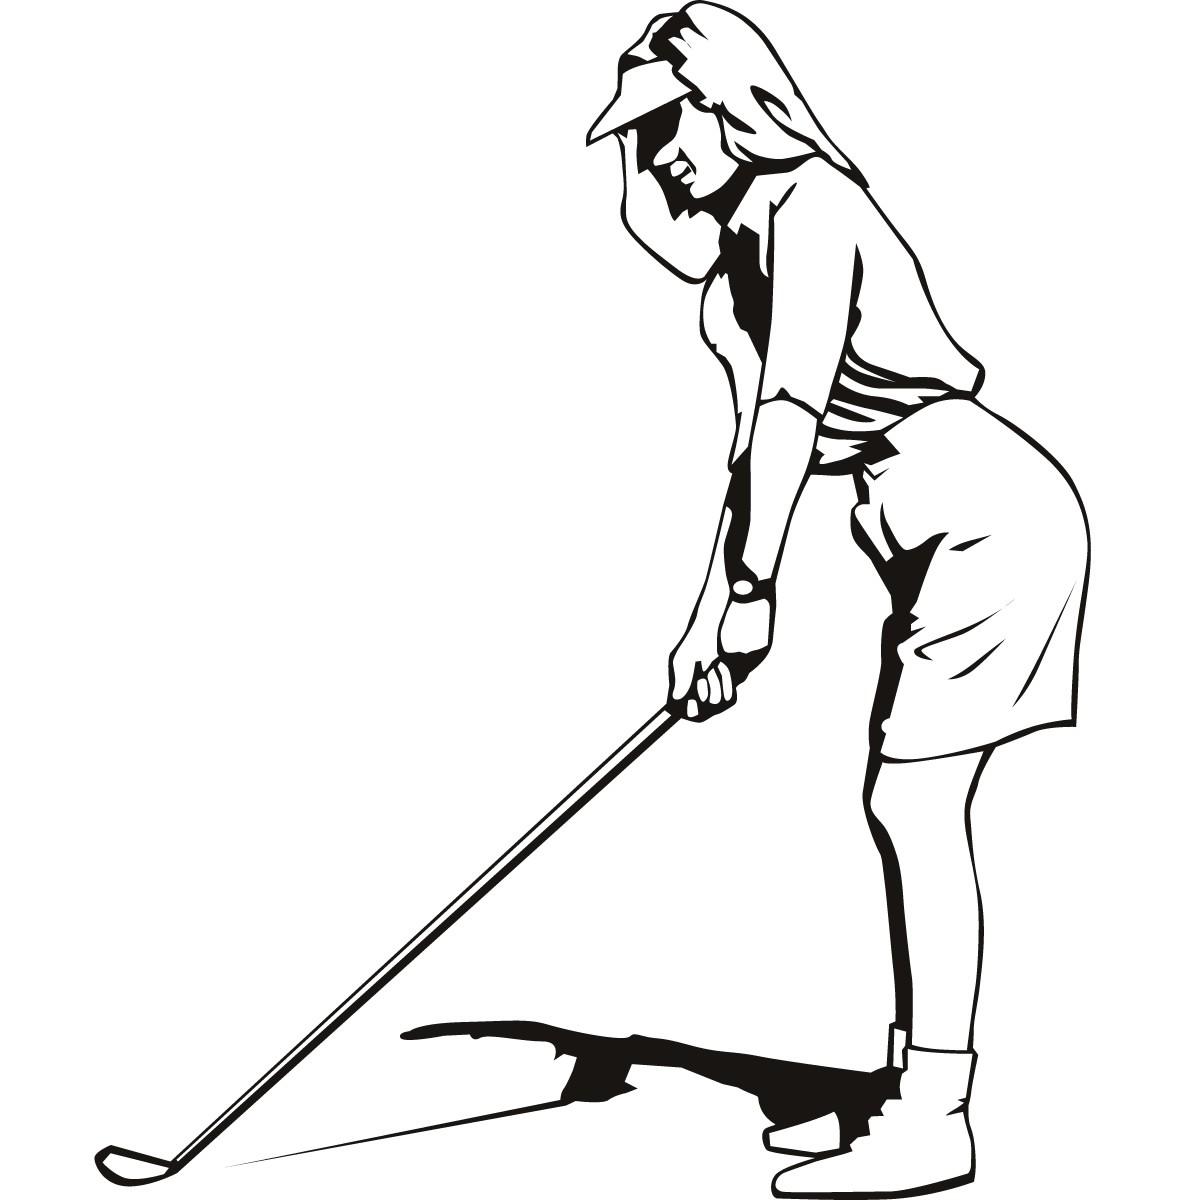 1200x1200 Golf Ball Funny Golf Clip Art Free Is Golfball Golfer Image